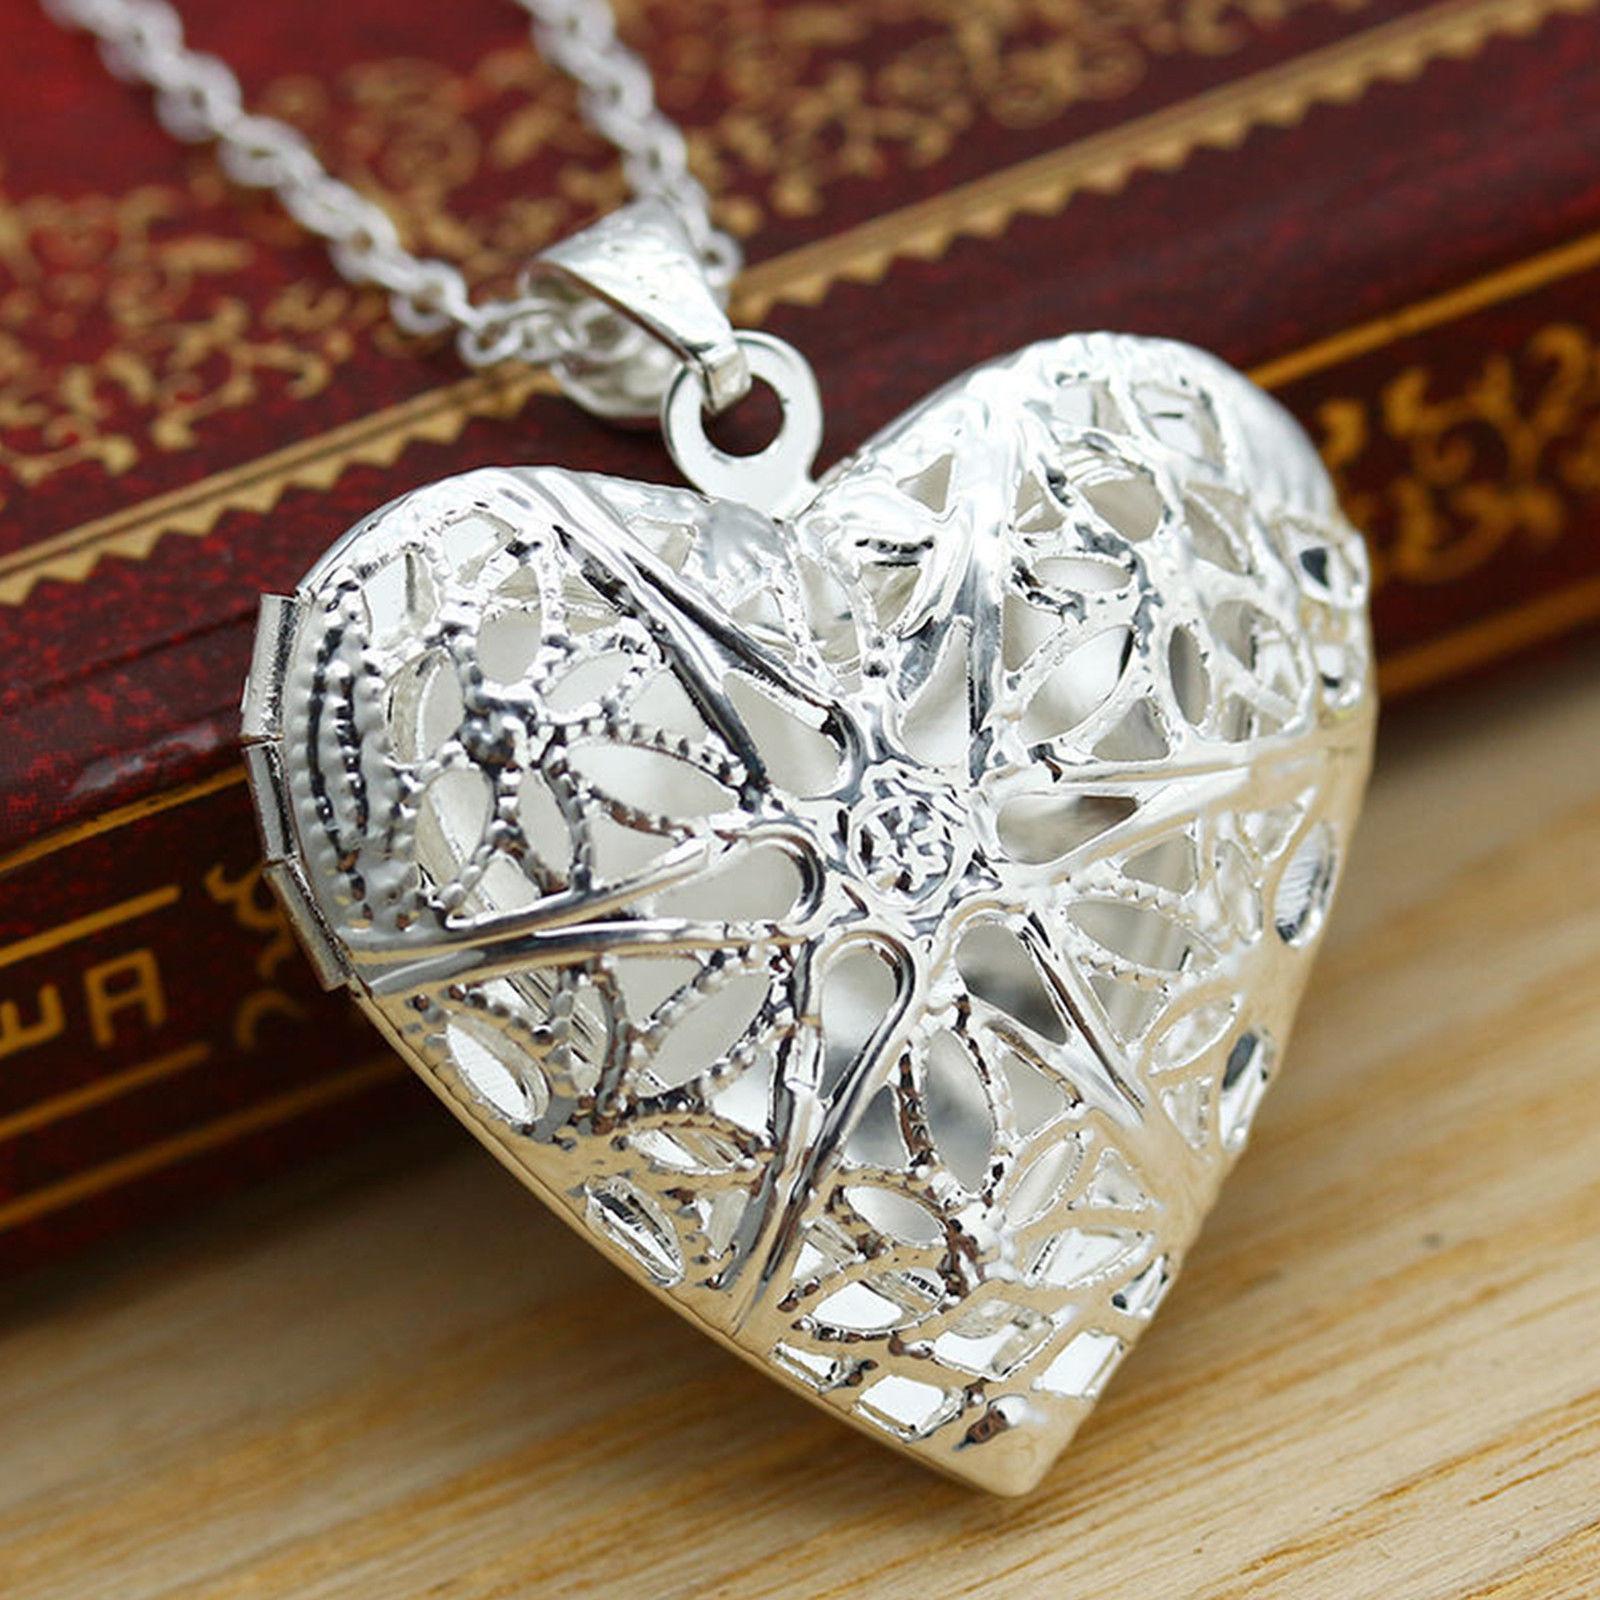 Медальоны в форме сердца от CHARMON фото 1